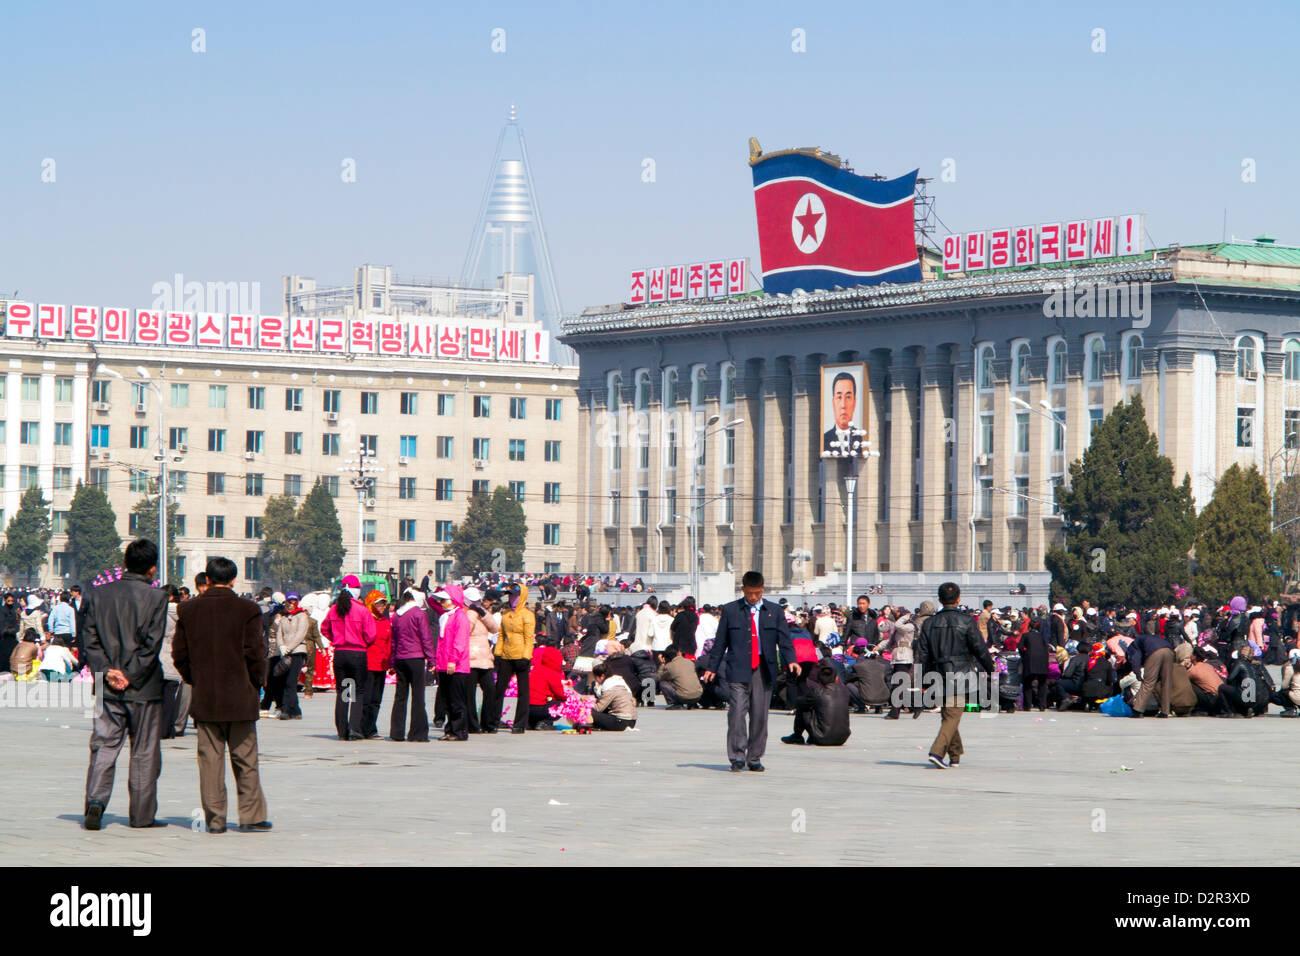 Kim Il Sung Square, Pyongyang, Democratic People's Republic of Korea (DPRK), North Korea, Asia - Stock Image